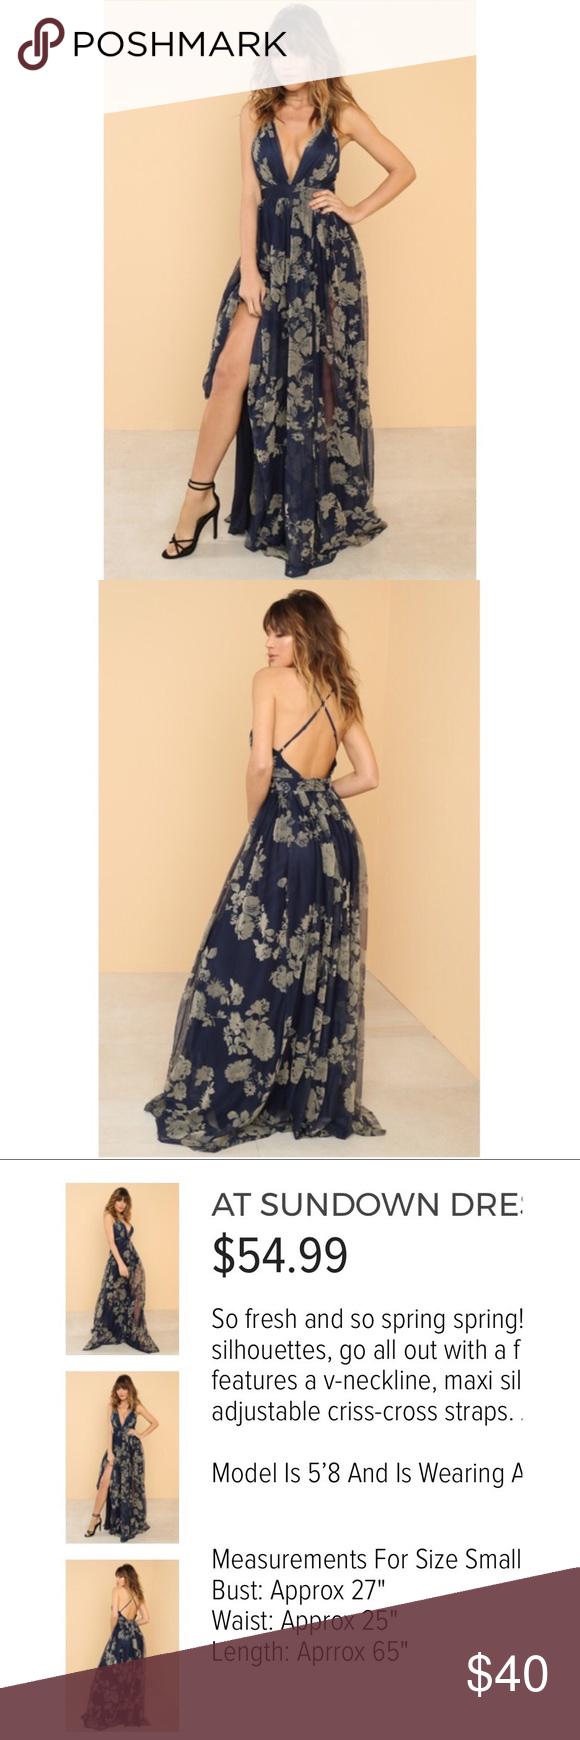 Navy blue dress nwt